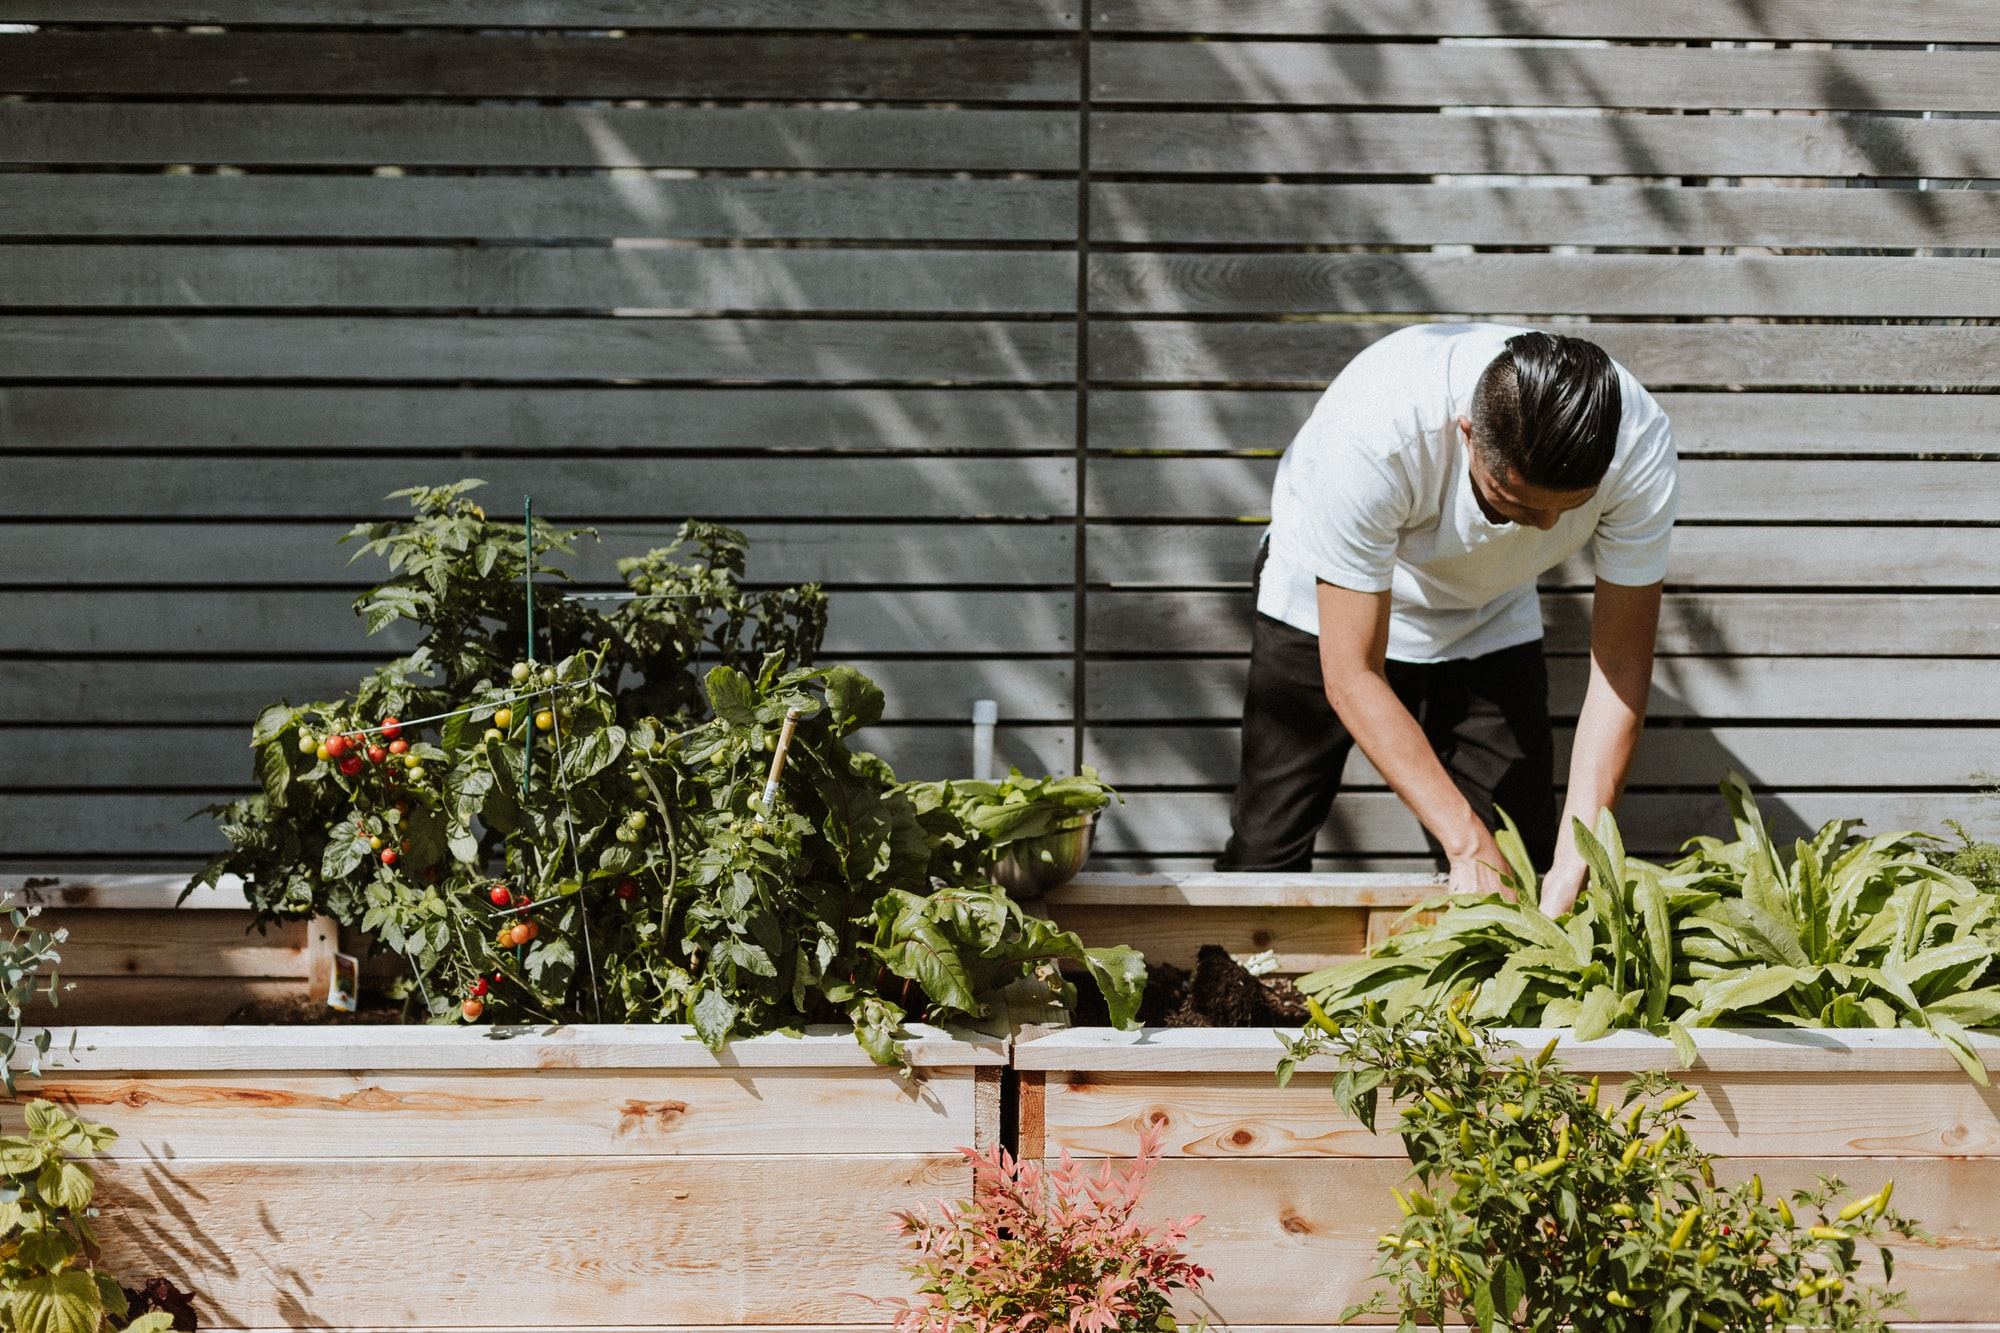 How guerilla gardening helps solve food deserts